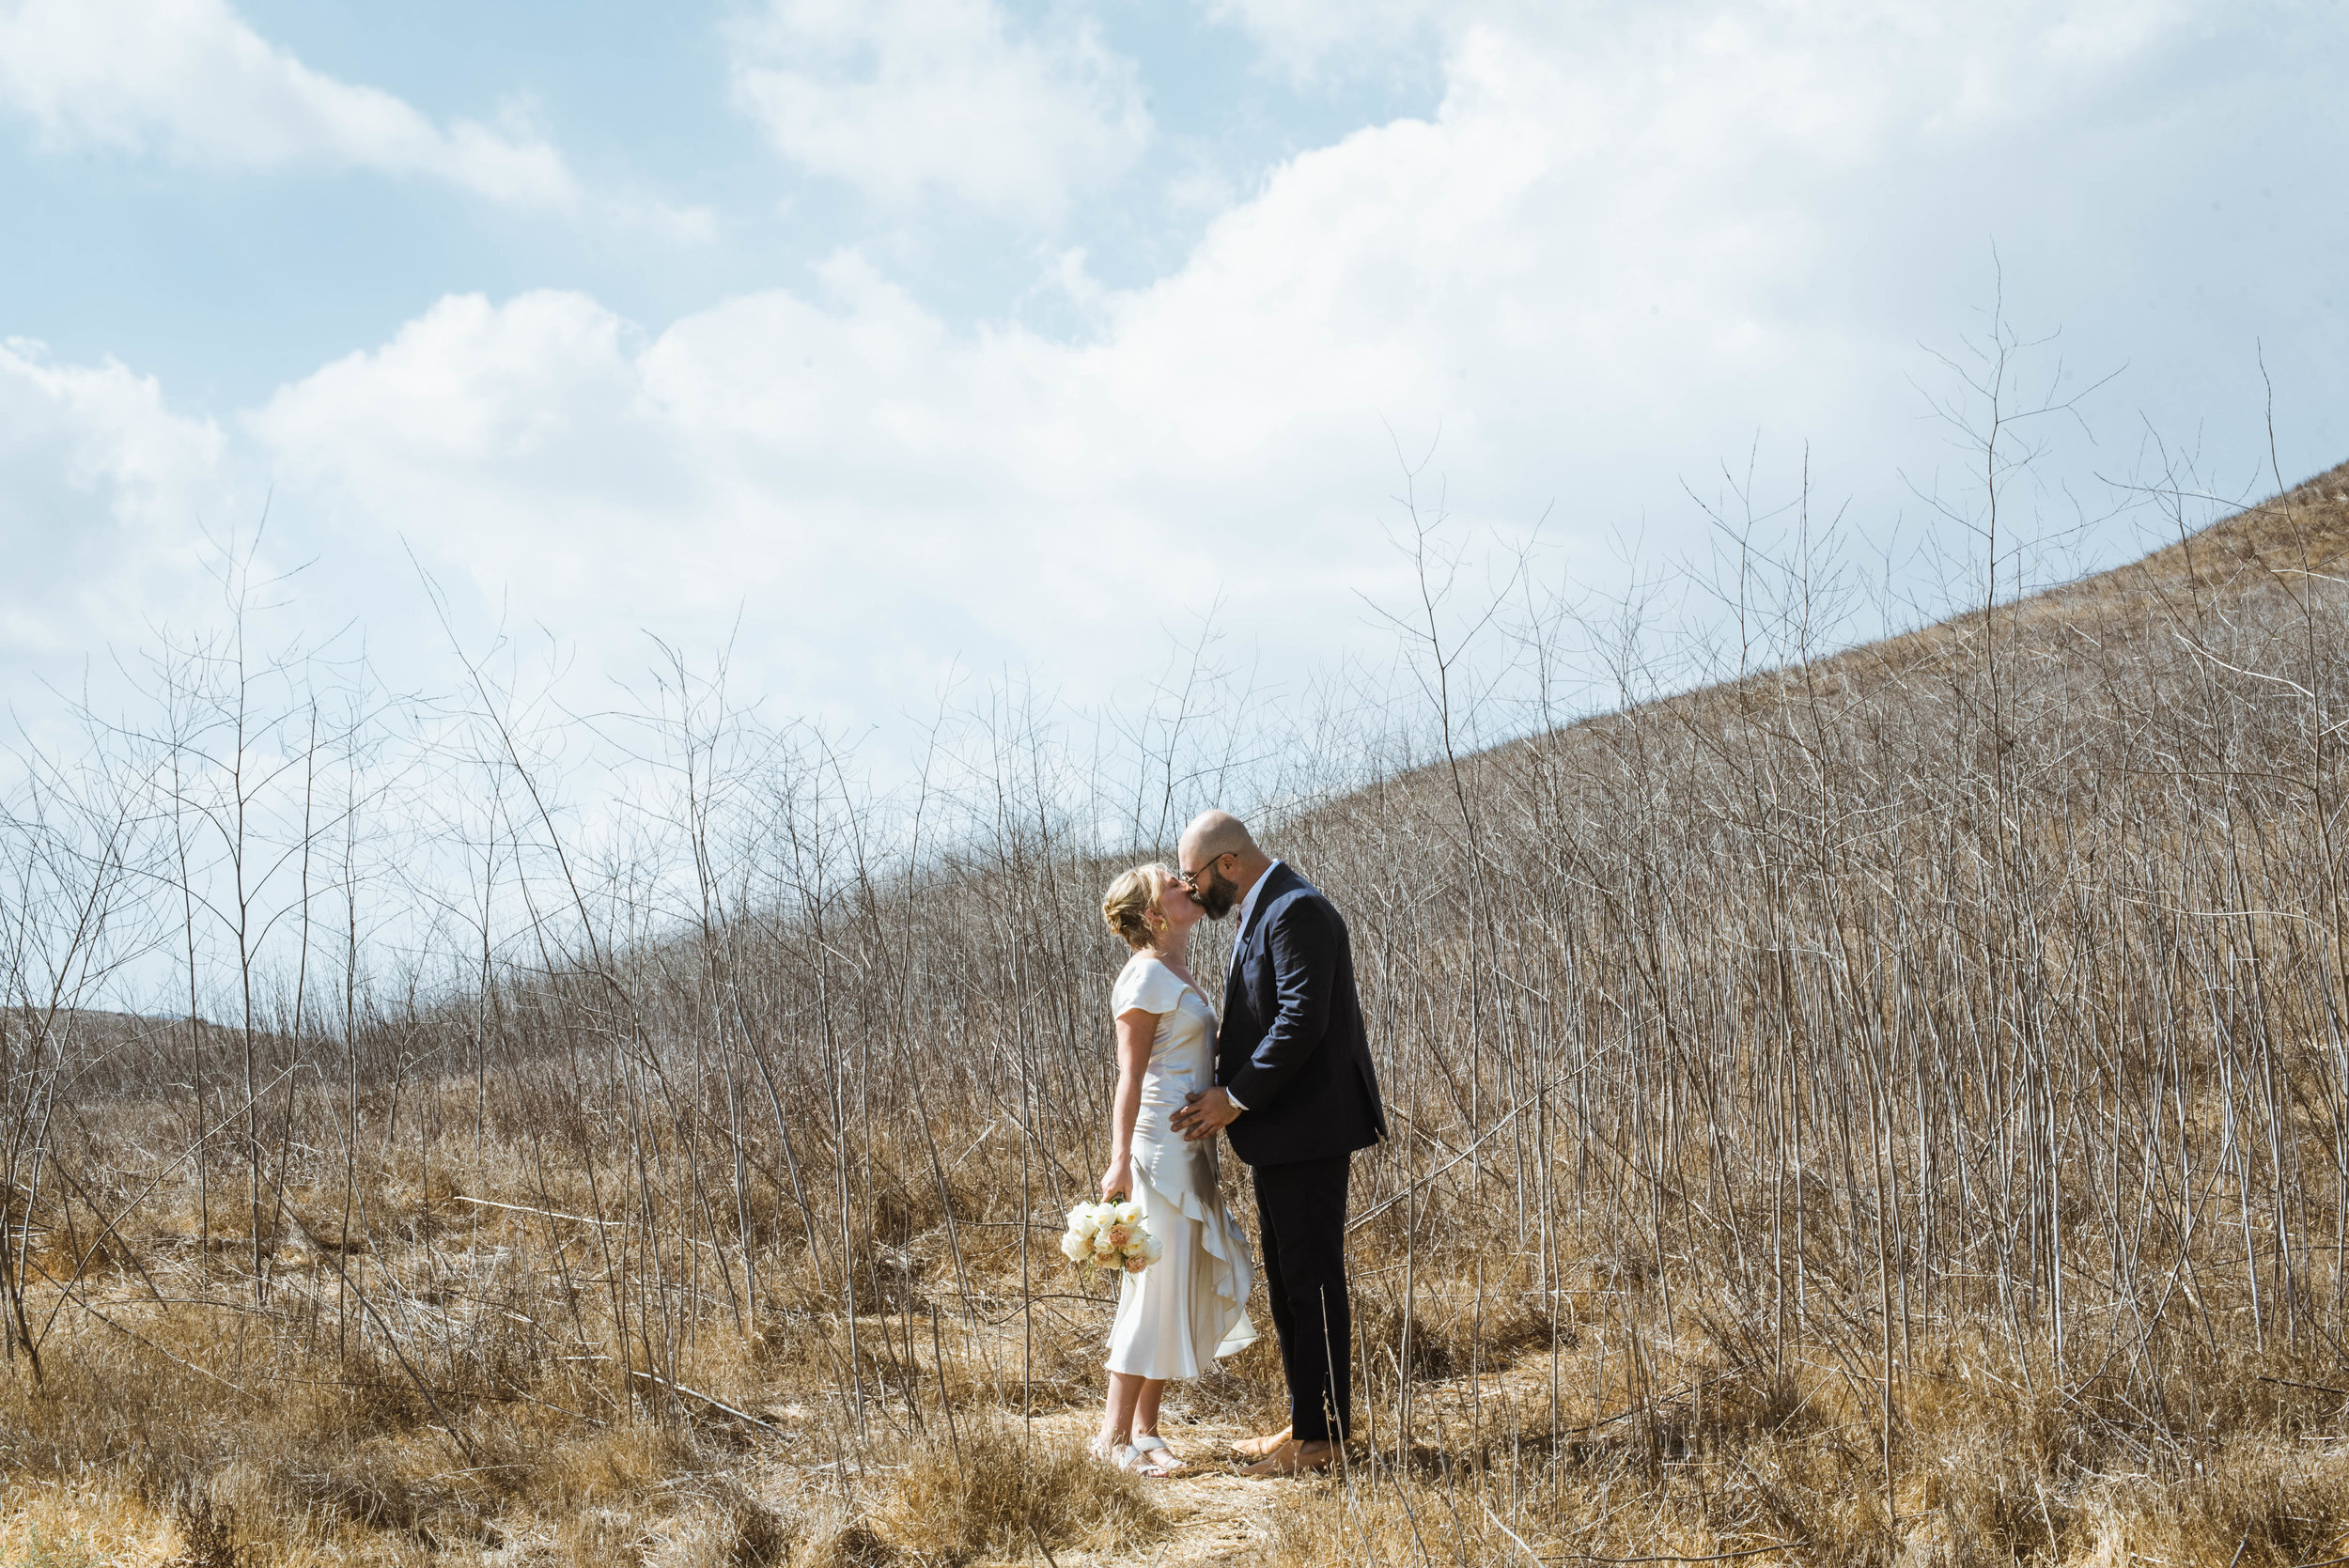 Intimate Backyard Wedding | Woodland Hills, CA